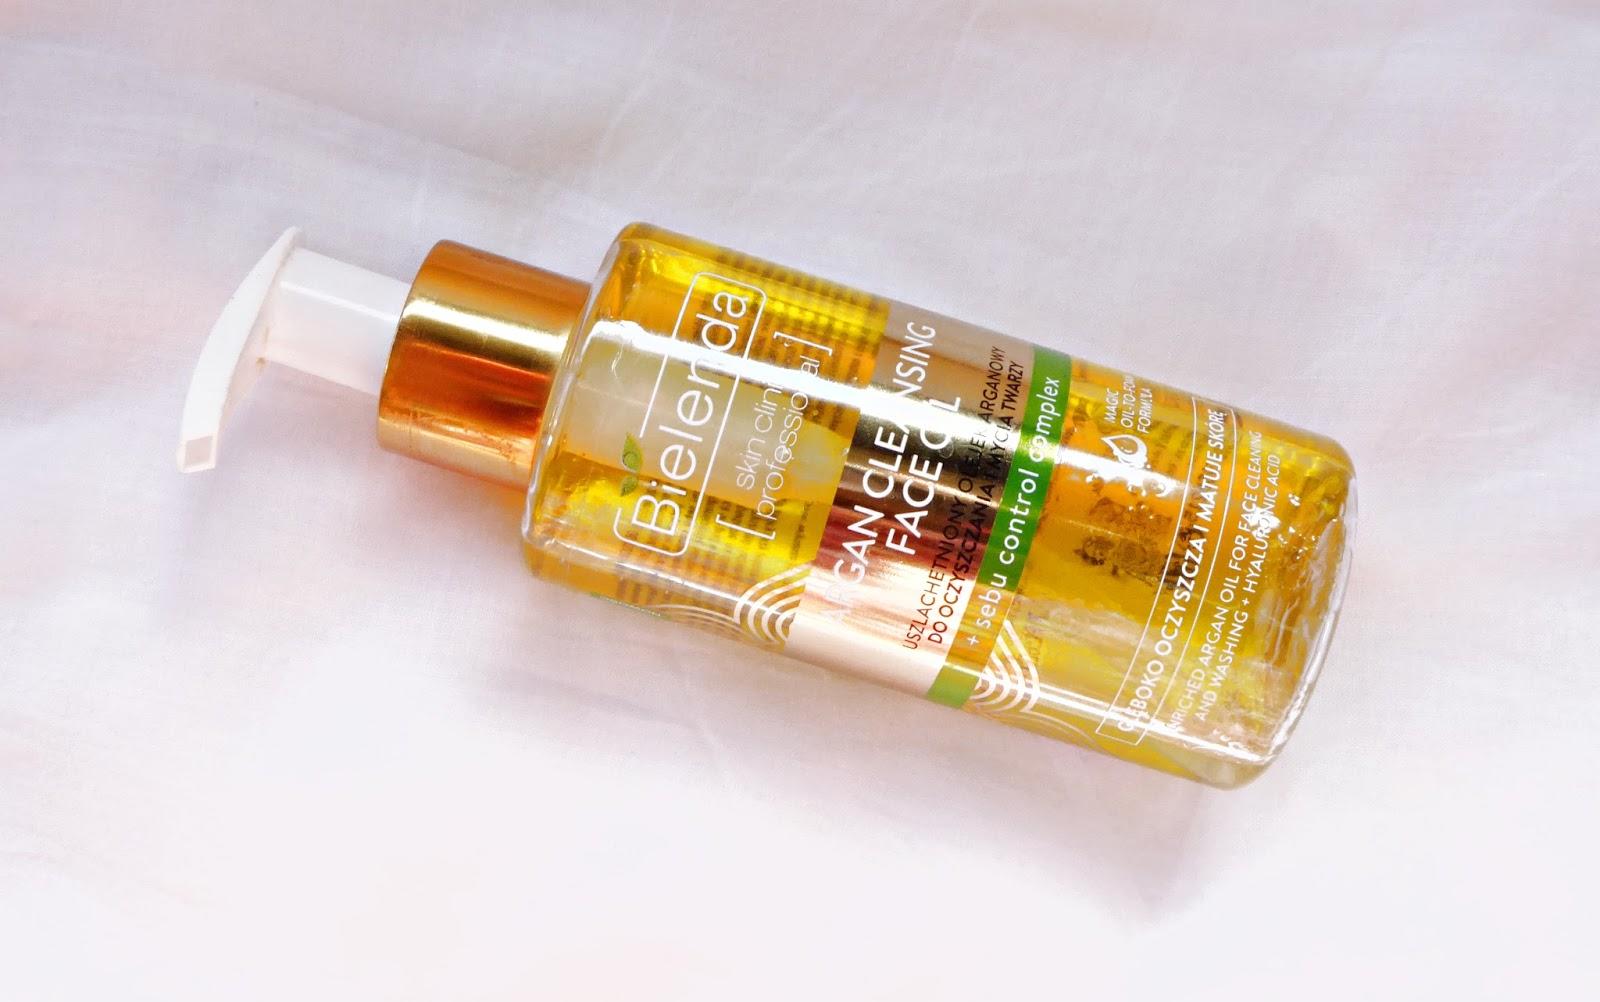 Argan cleasing face oil (sebum control complex) de Bielenda, un aceite limpiador low cost